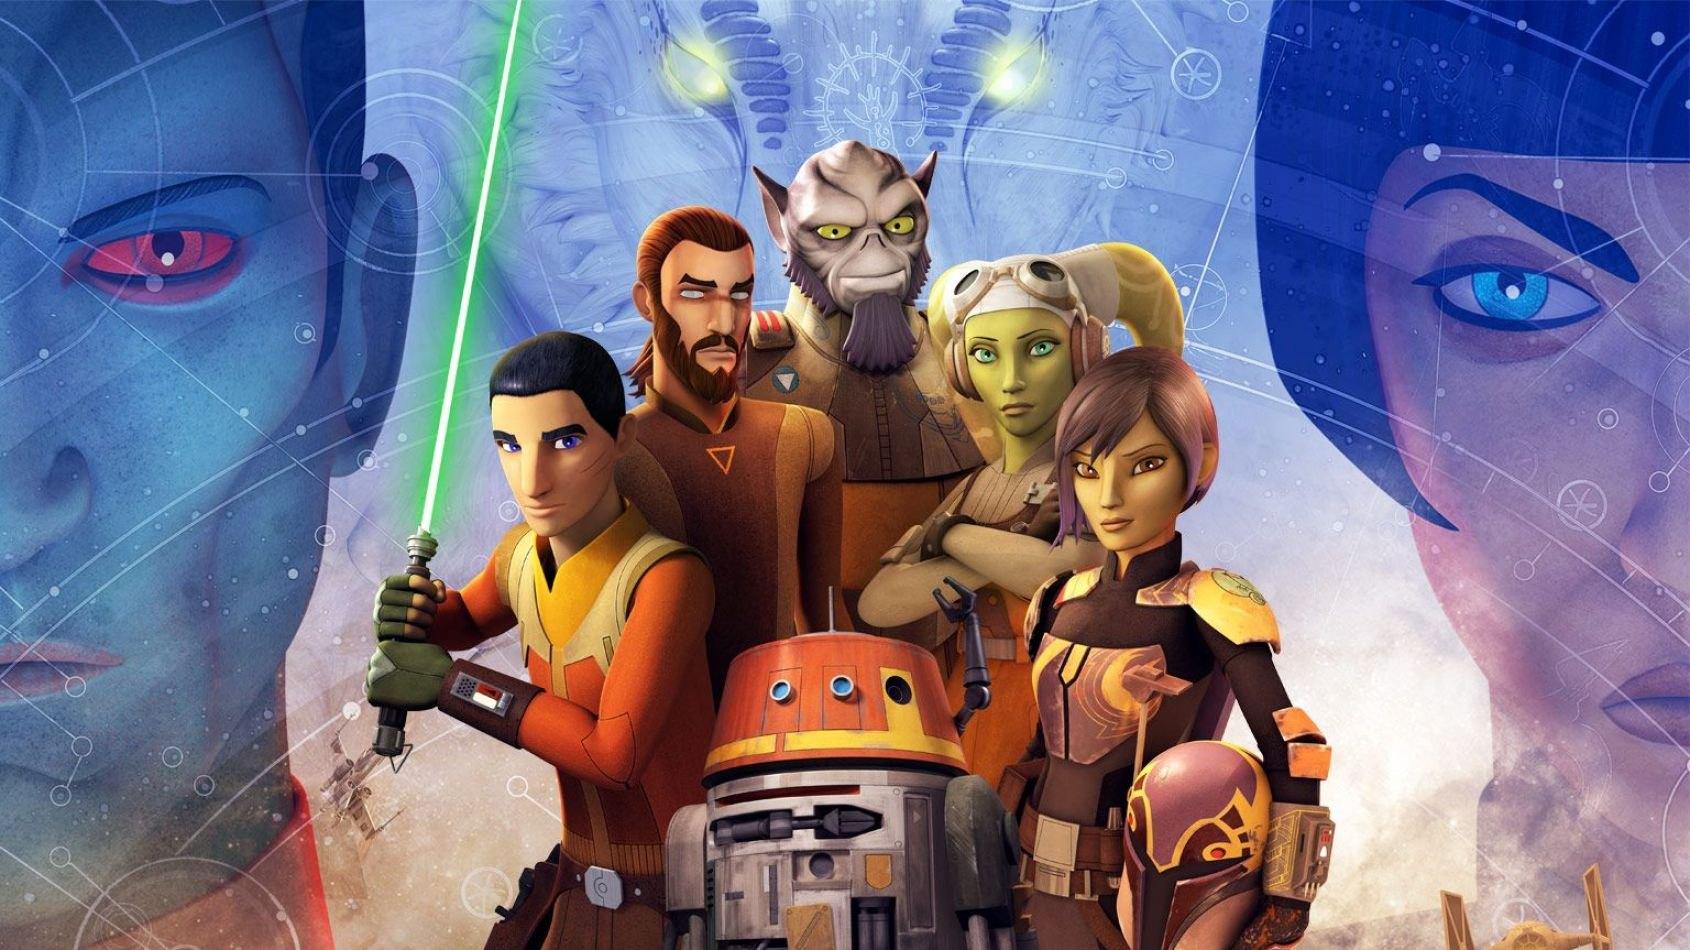 Un drame à venir dans Star Wars Rebels ?